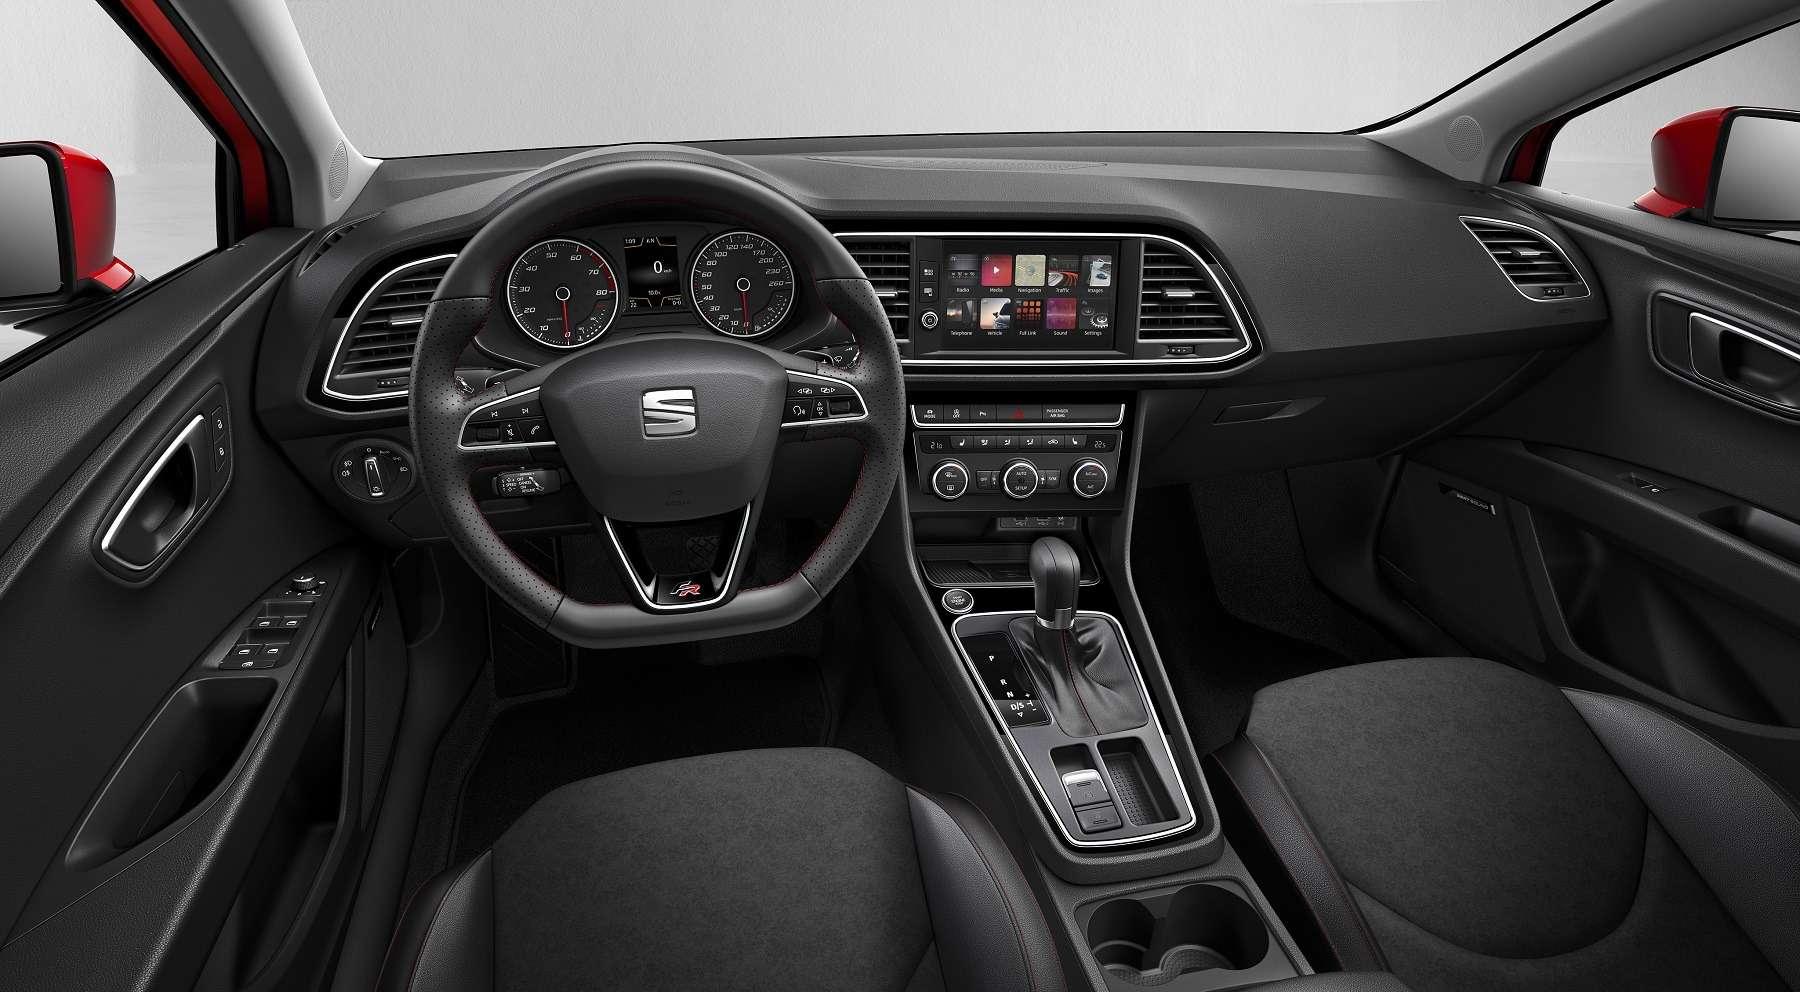 В лучах светодиодов: SEAT Leon обновился снаружи ивнутри— фото 651510